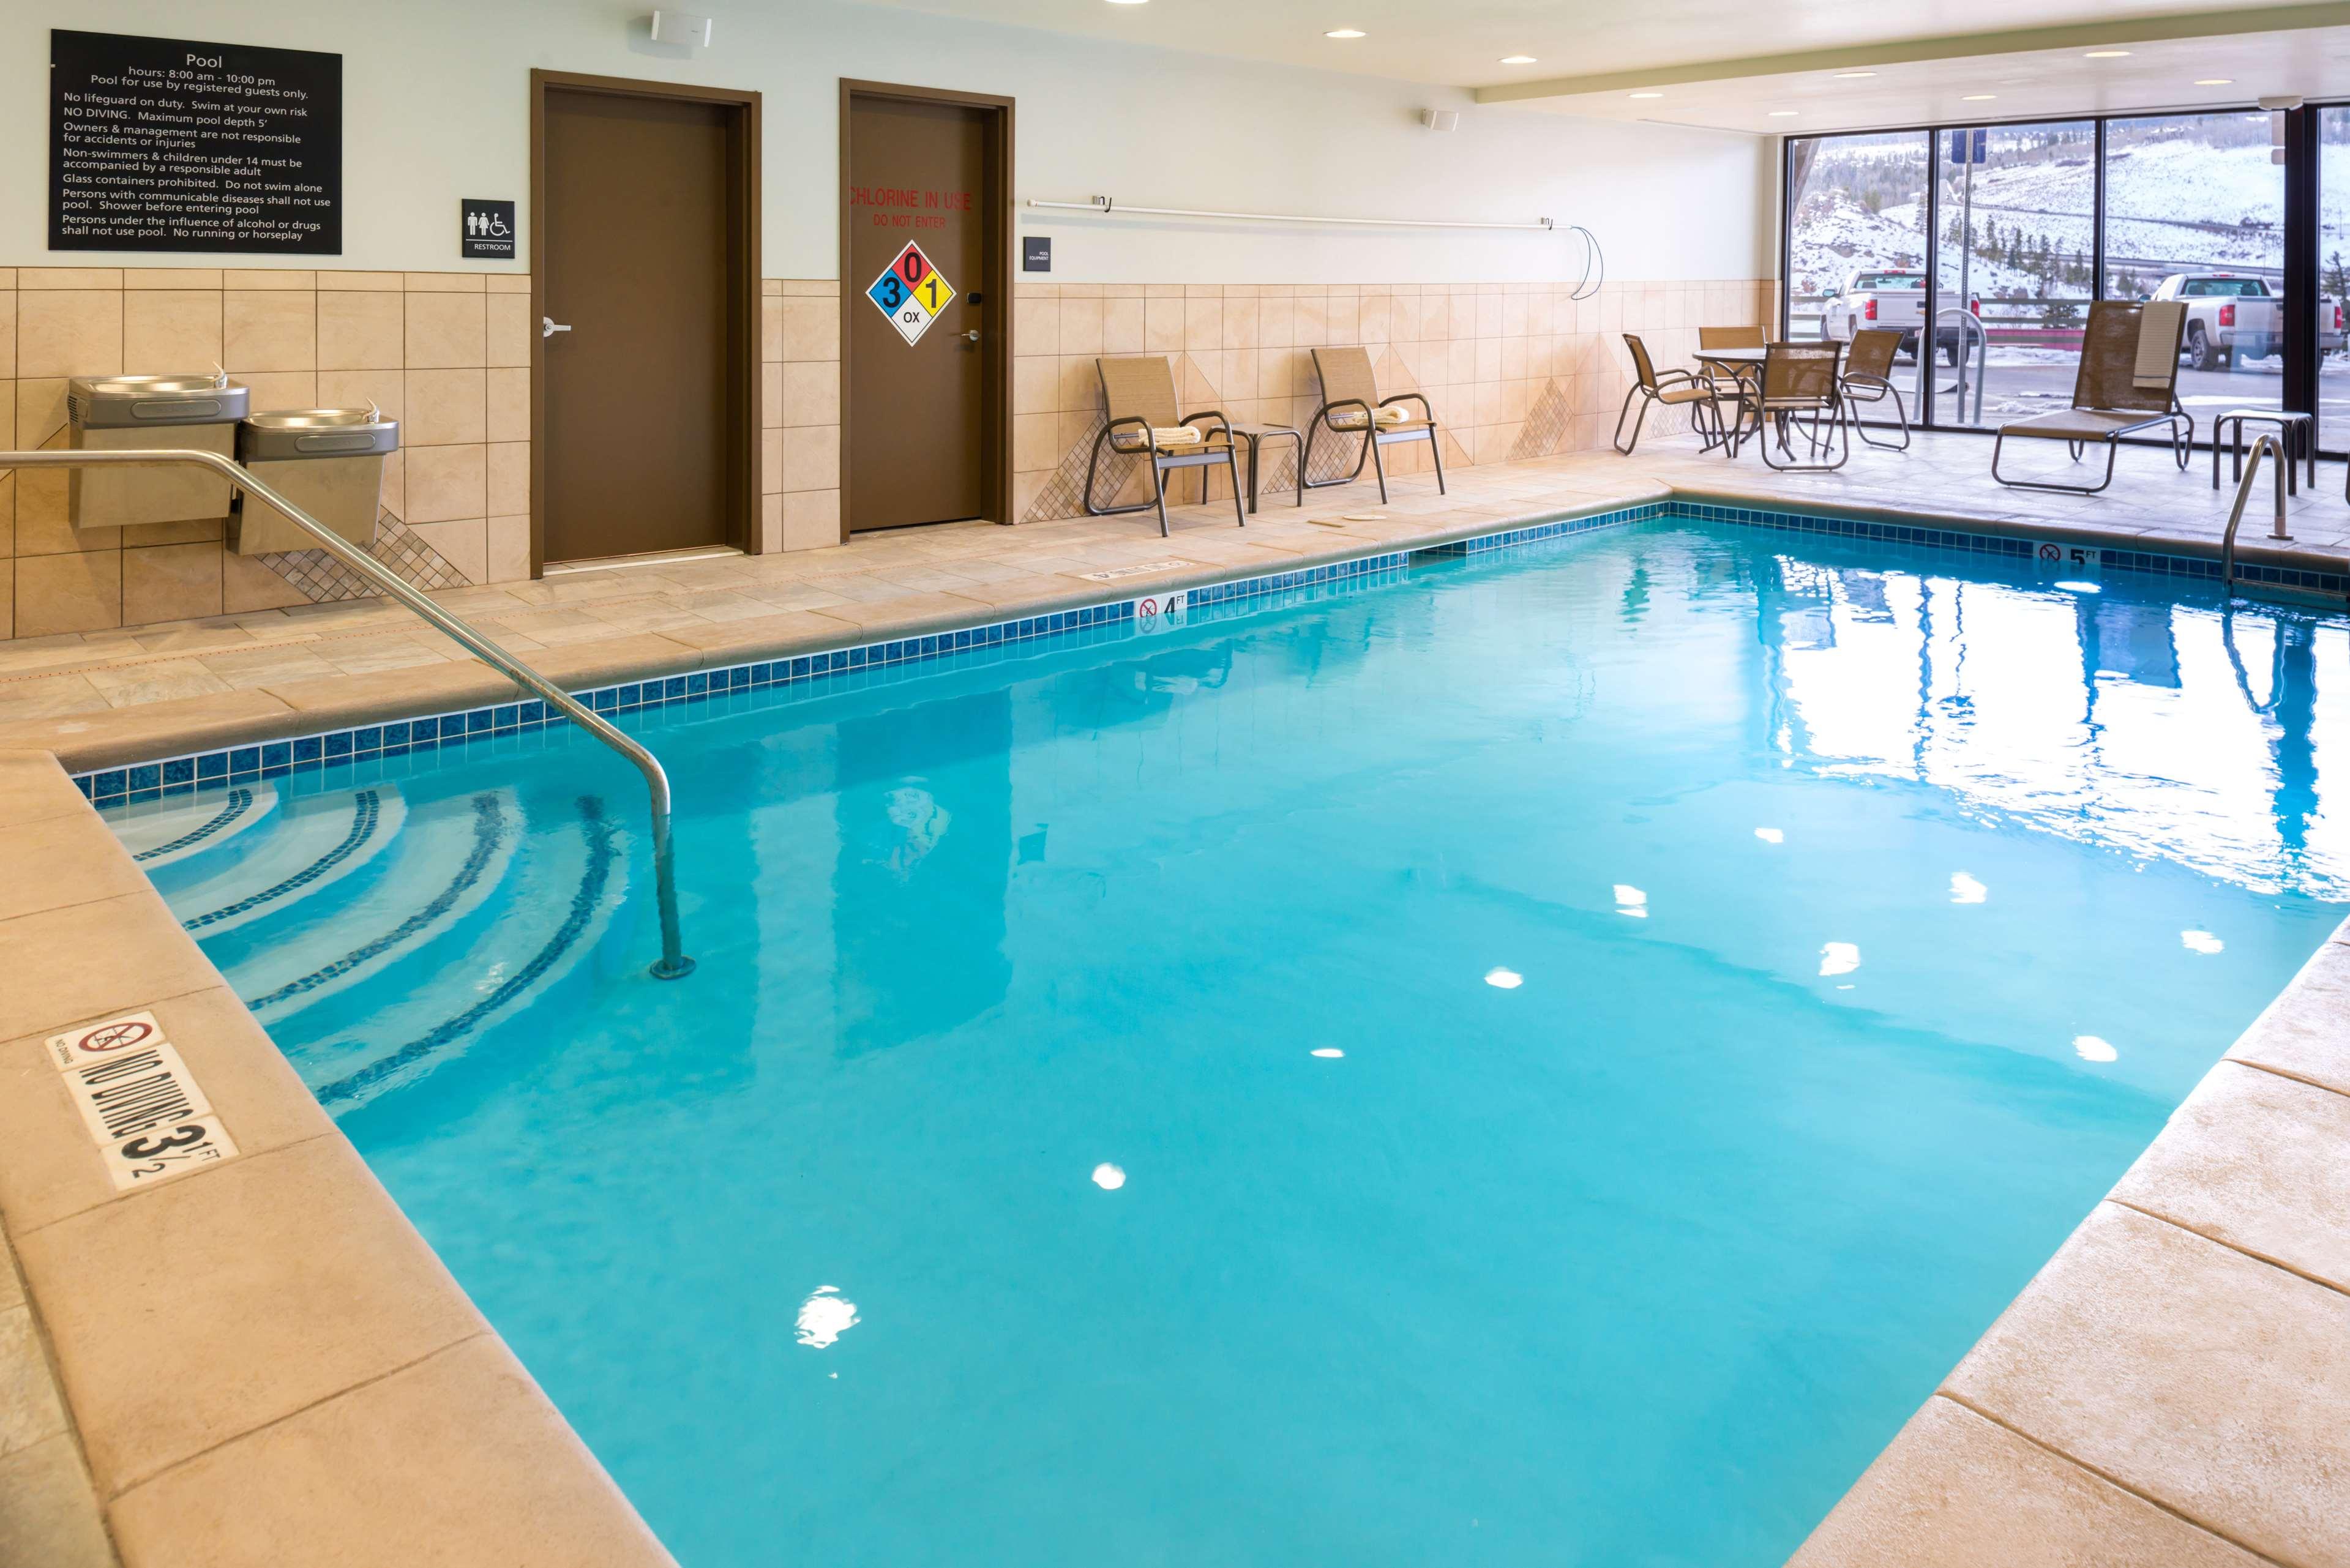 Hampton Inn & Suites Silverthorne image 6